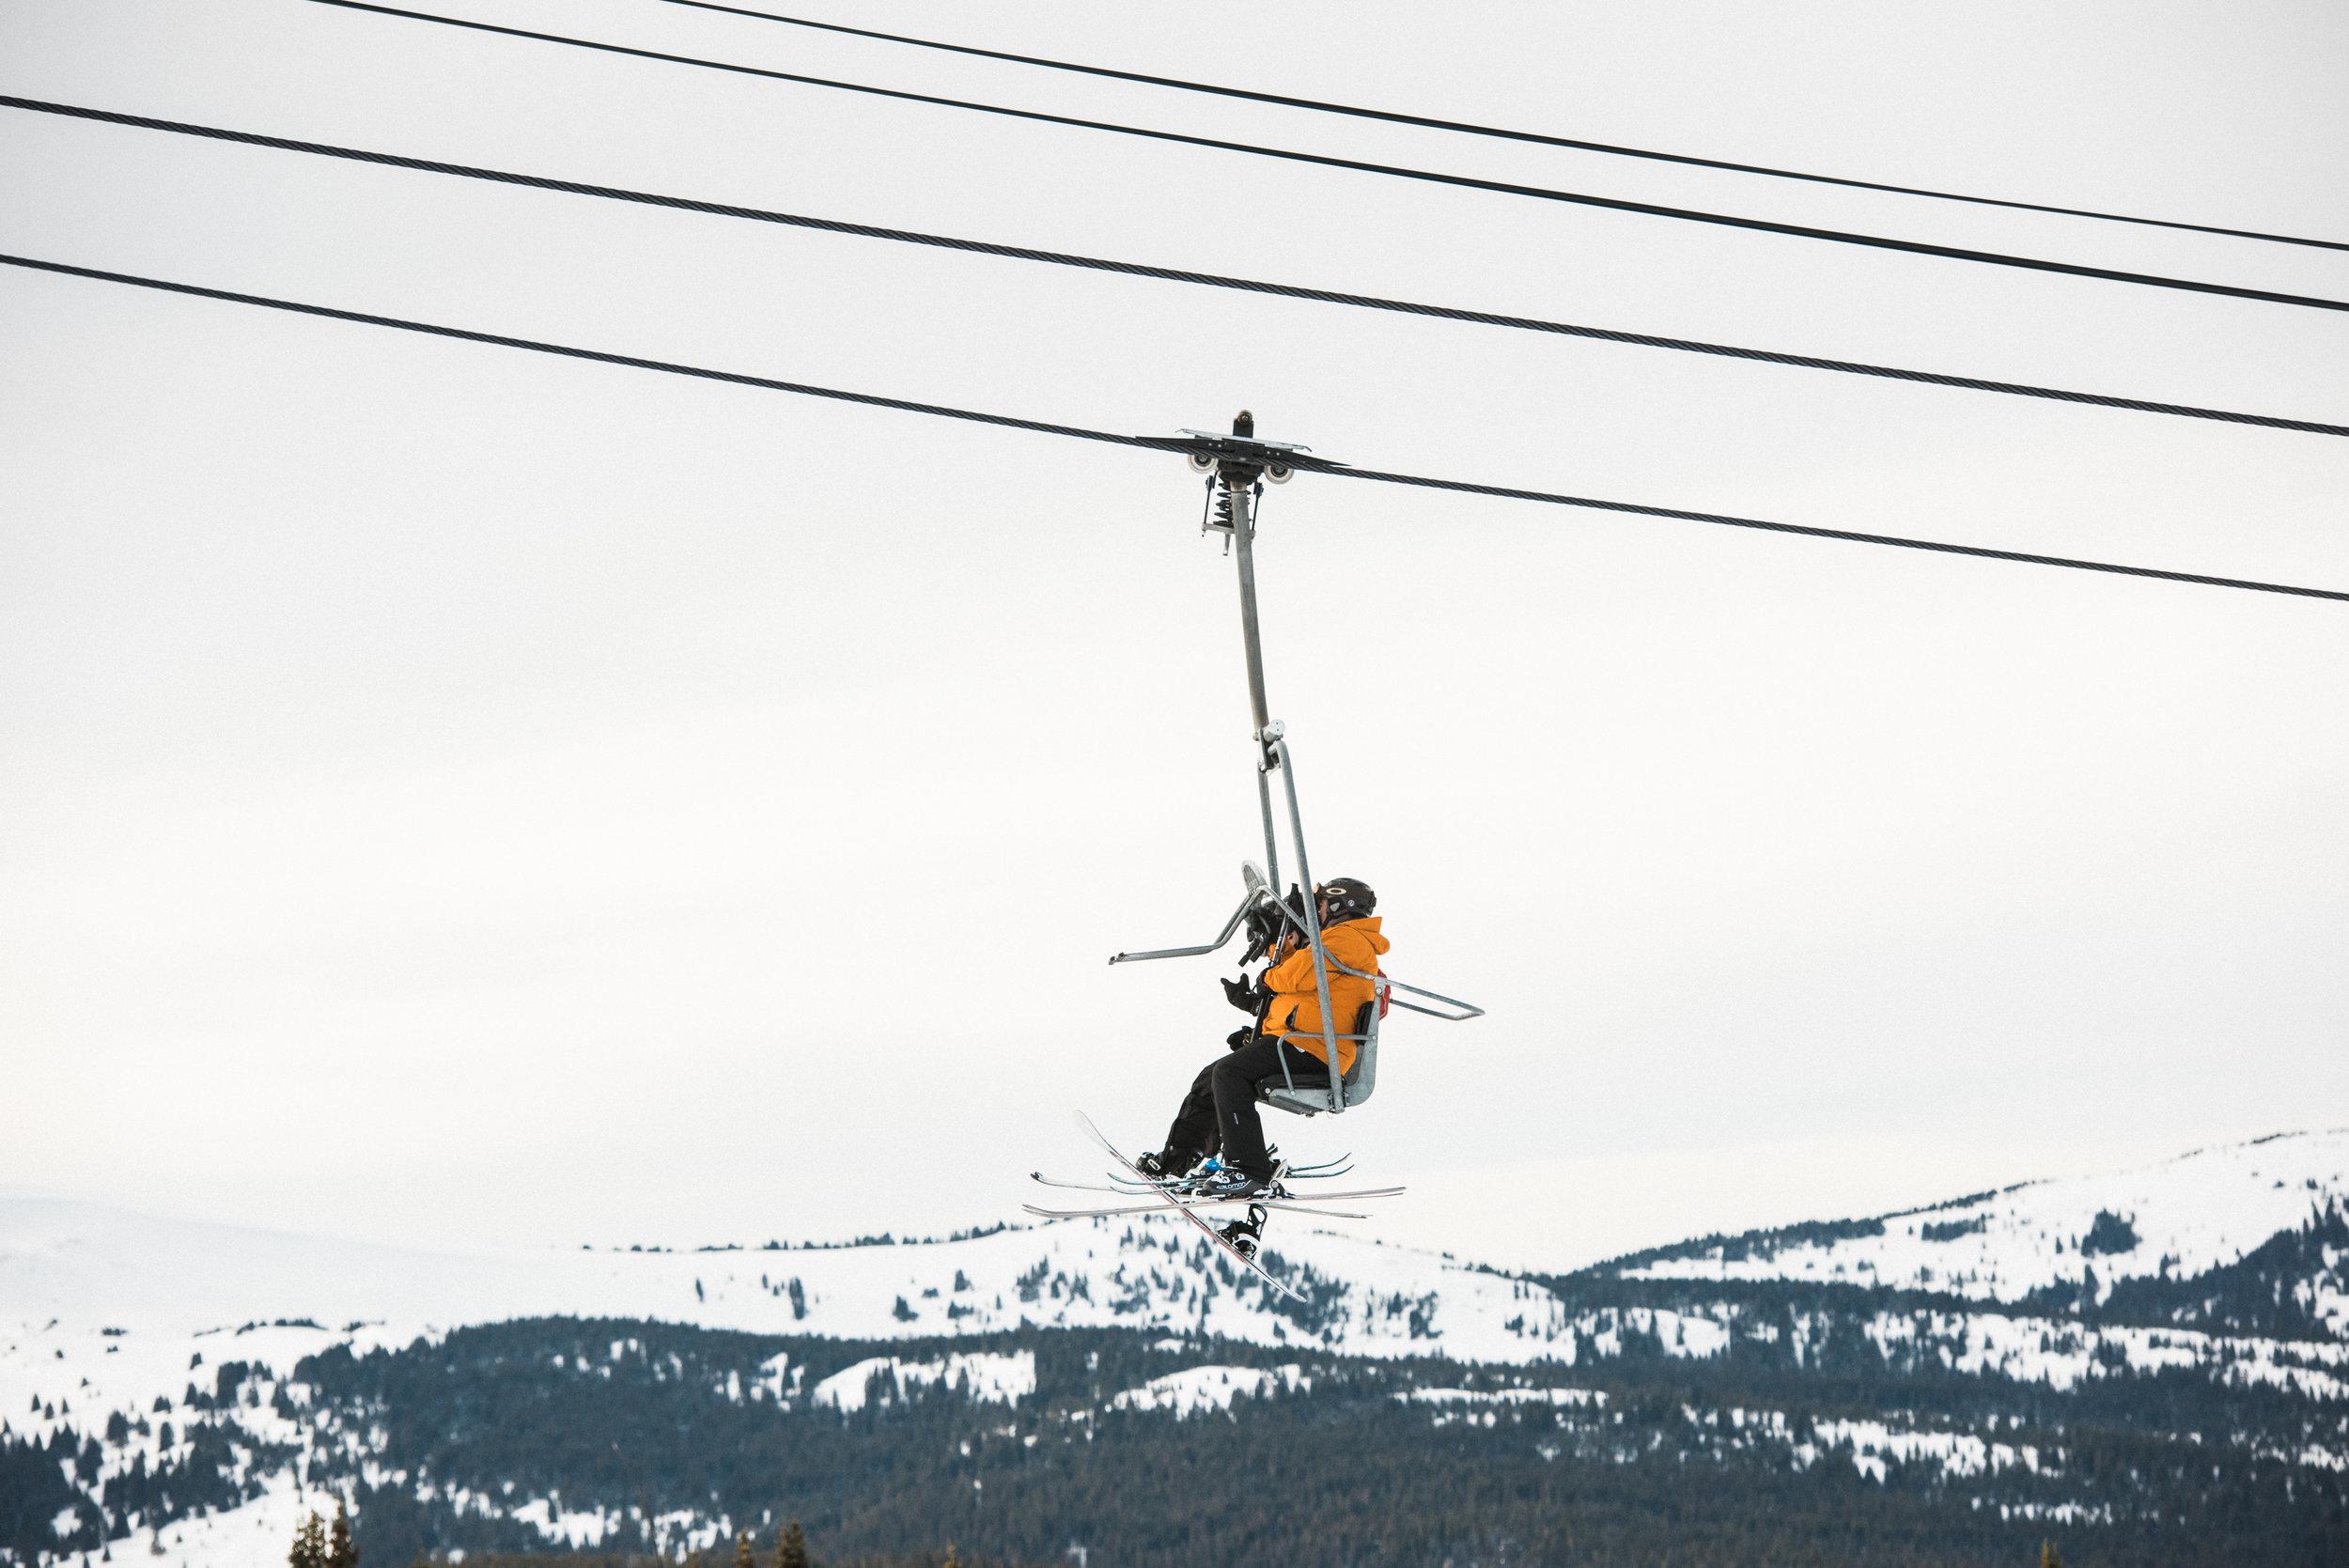 TaraShupe_Outdoor_Photographer_Loweprobags_Colorado_Copper_Mountains_Ski_71.jpg